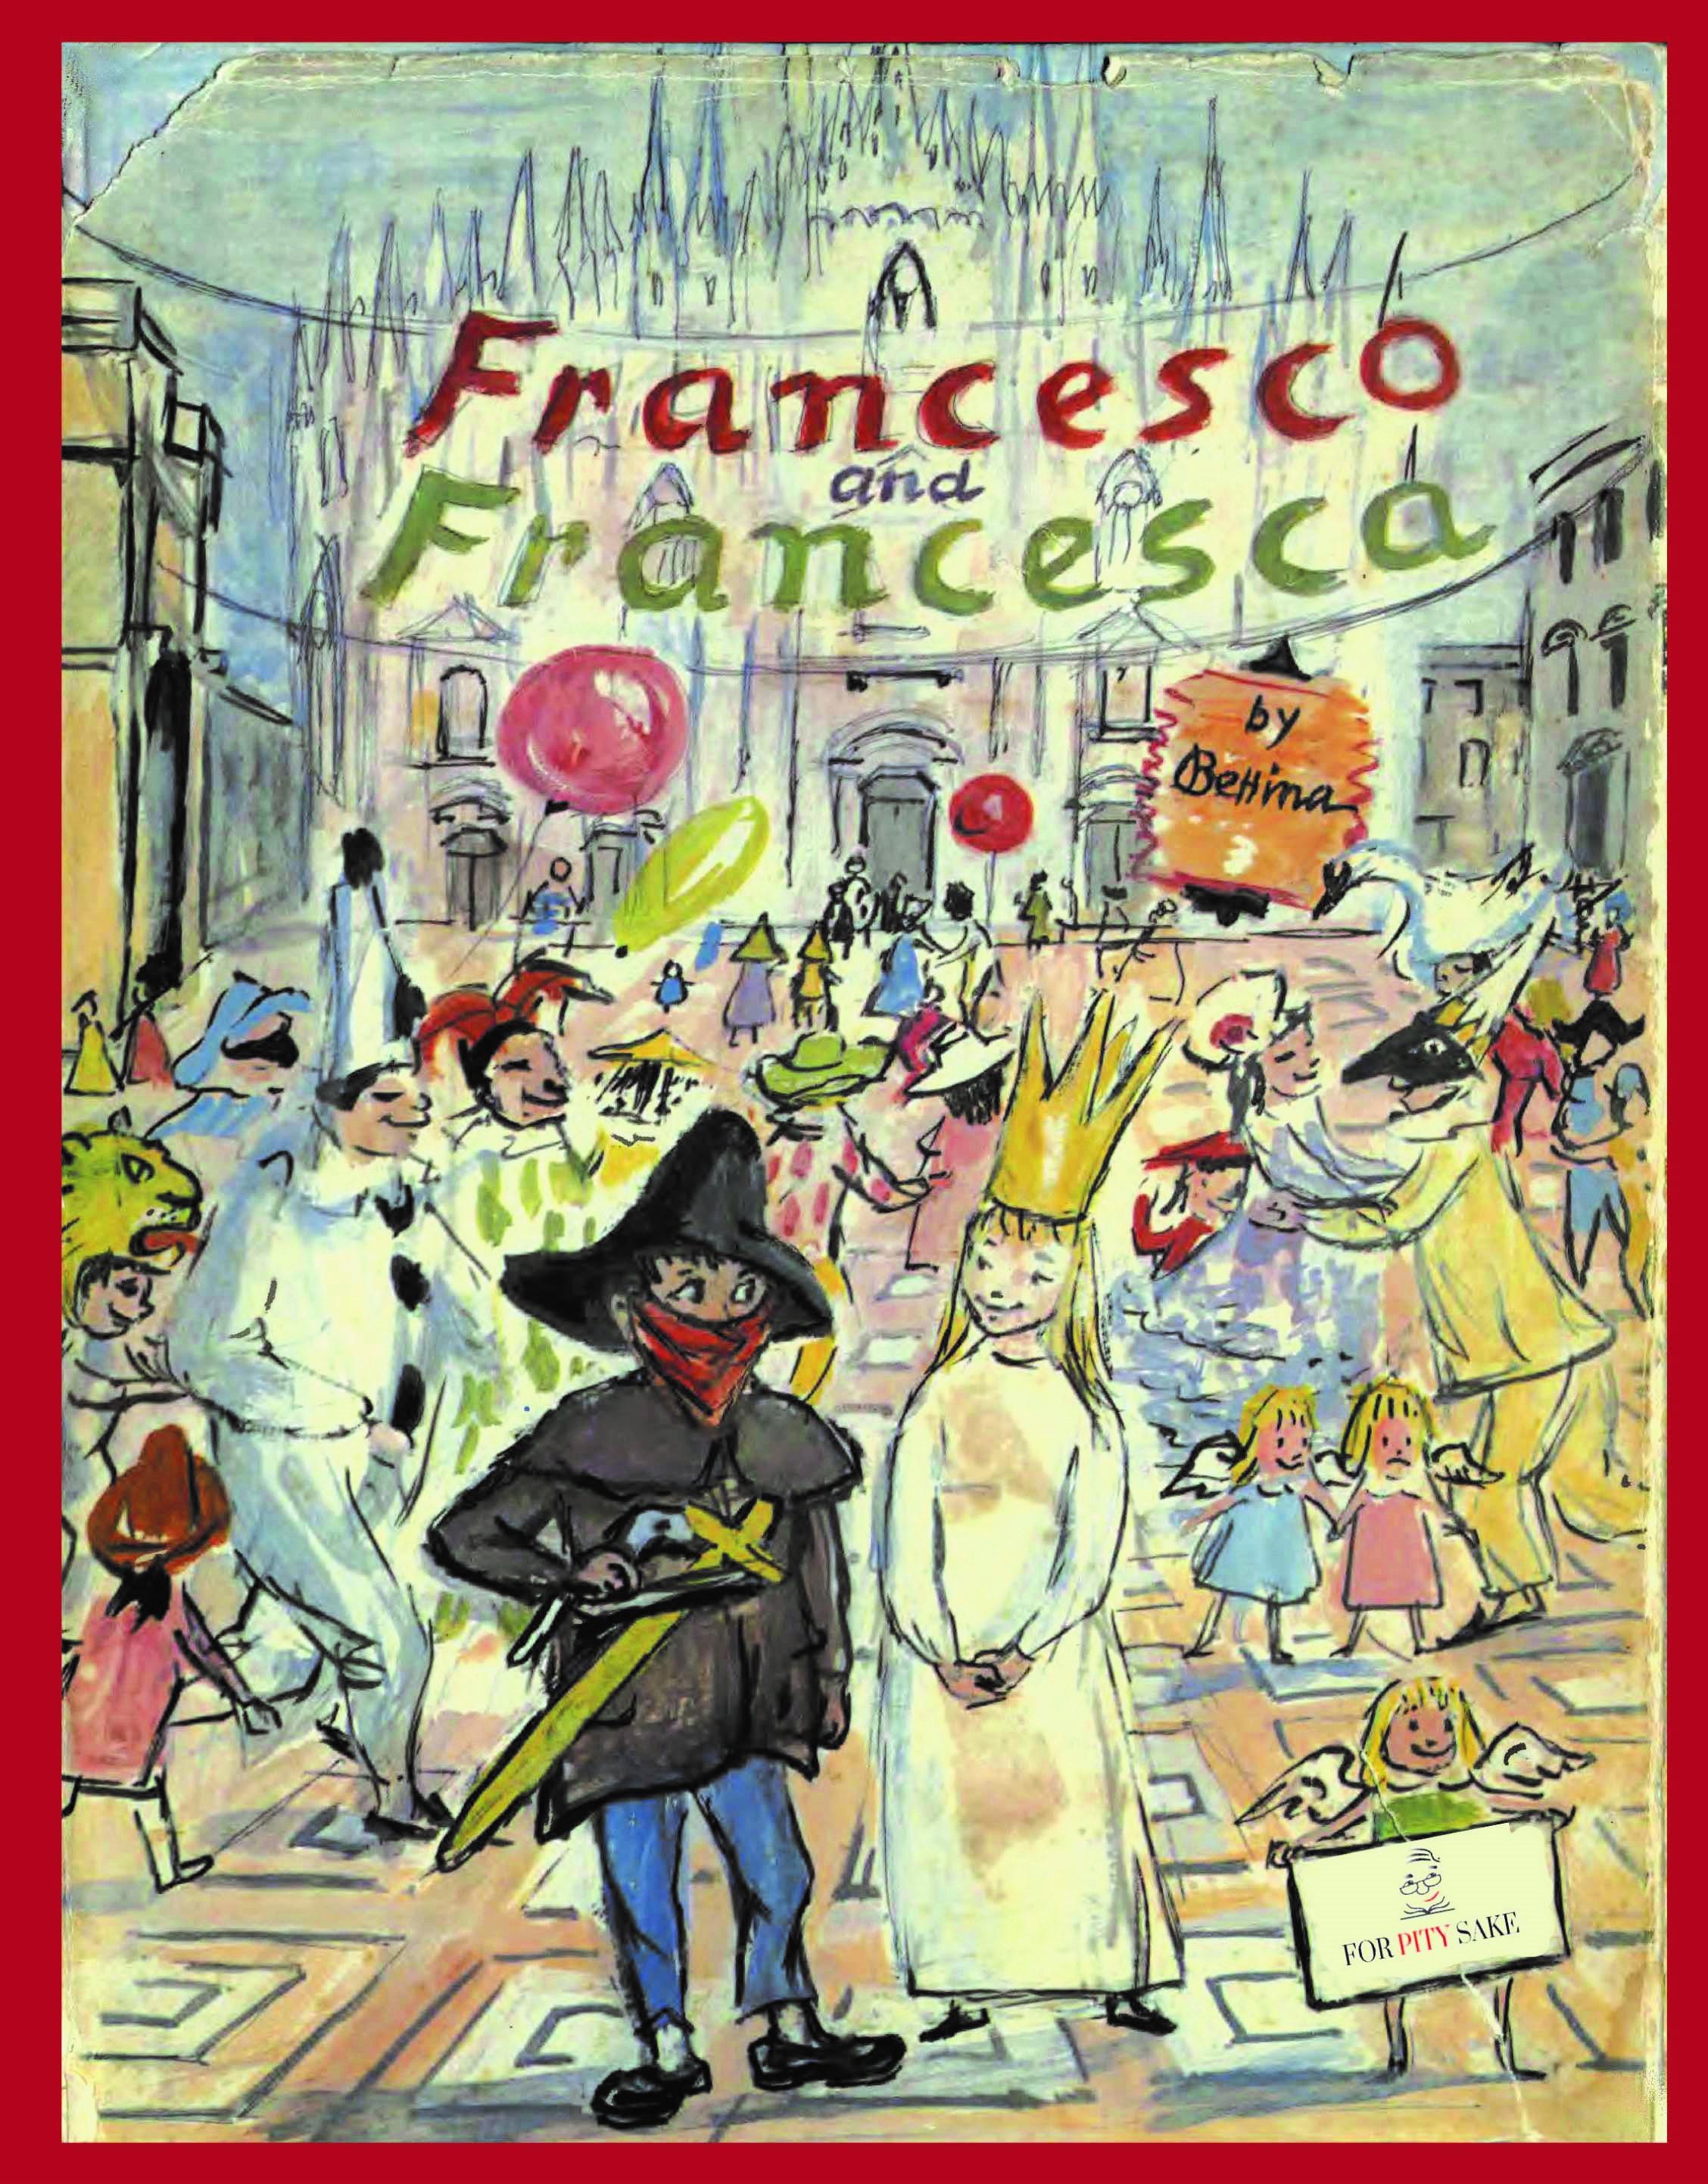 COVER FRONT - Francesco&Francesca by Bettina.jpg